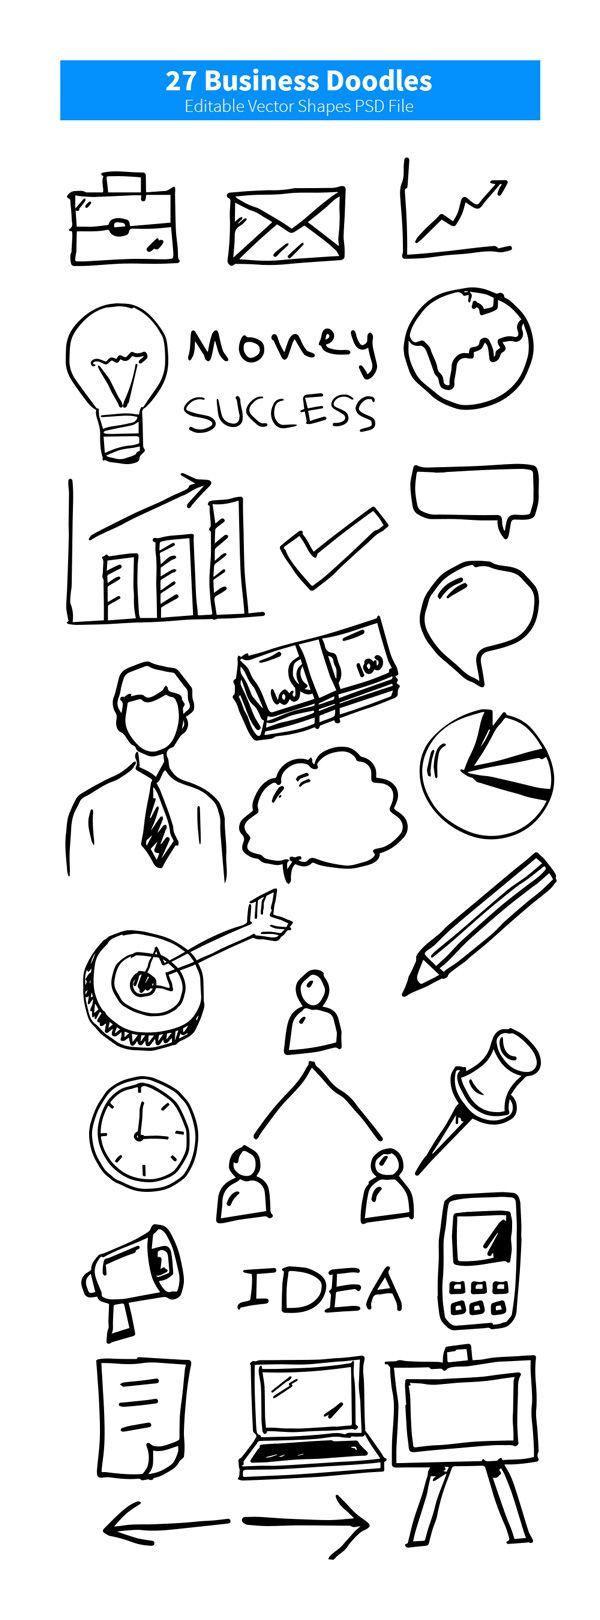 27 Business Doodles (Vector PSD) 손그림 아이콘 (Vector PSD)